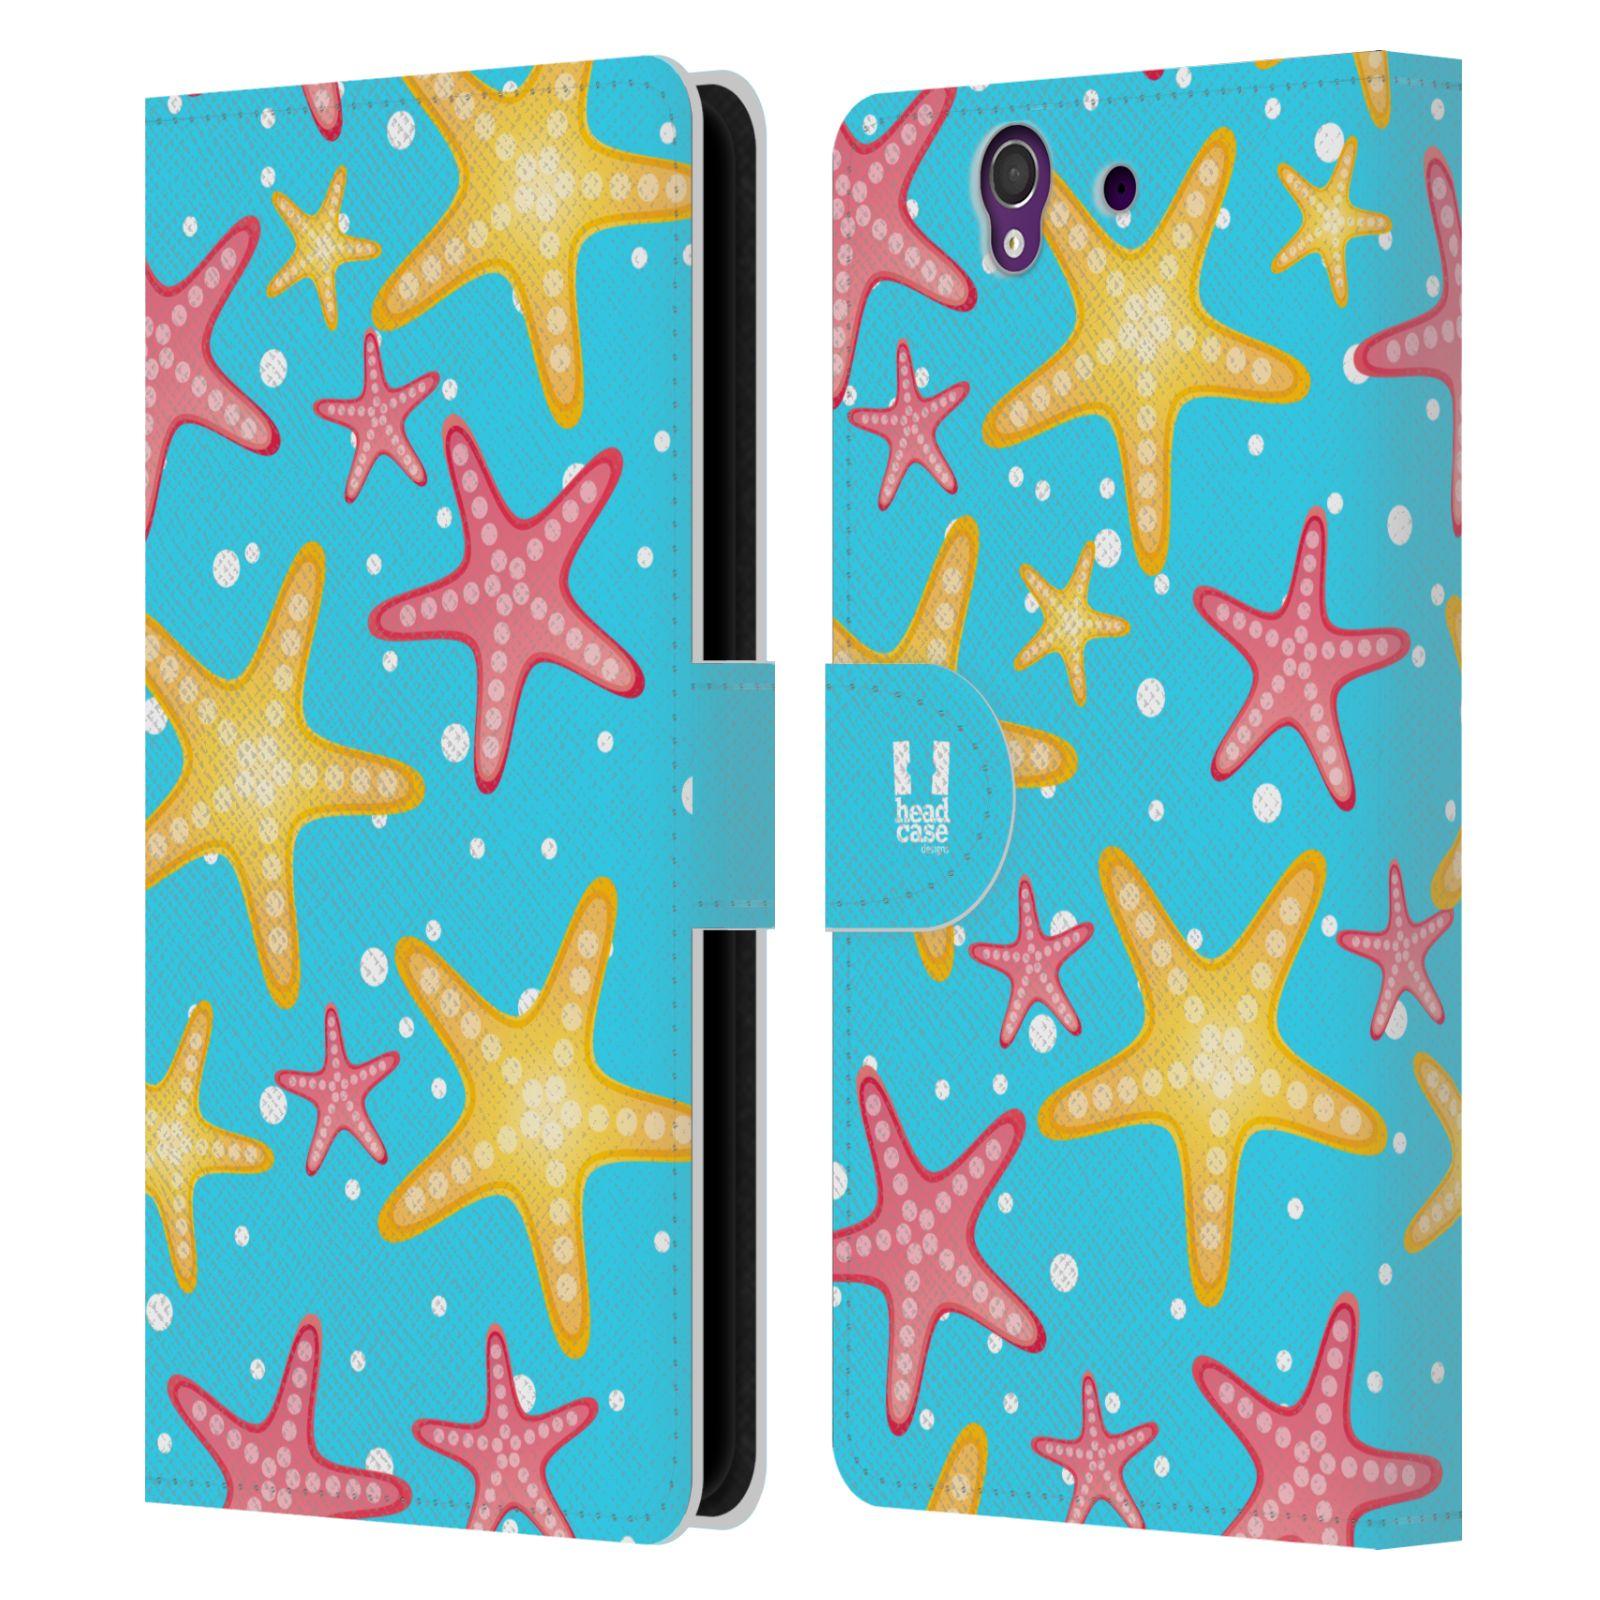 HEAD CASE Flipové pouzdro pro mobil SONY XPERIA Z (C6603) Mořský živočich hvězdice modrá barva pozadí